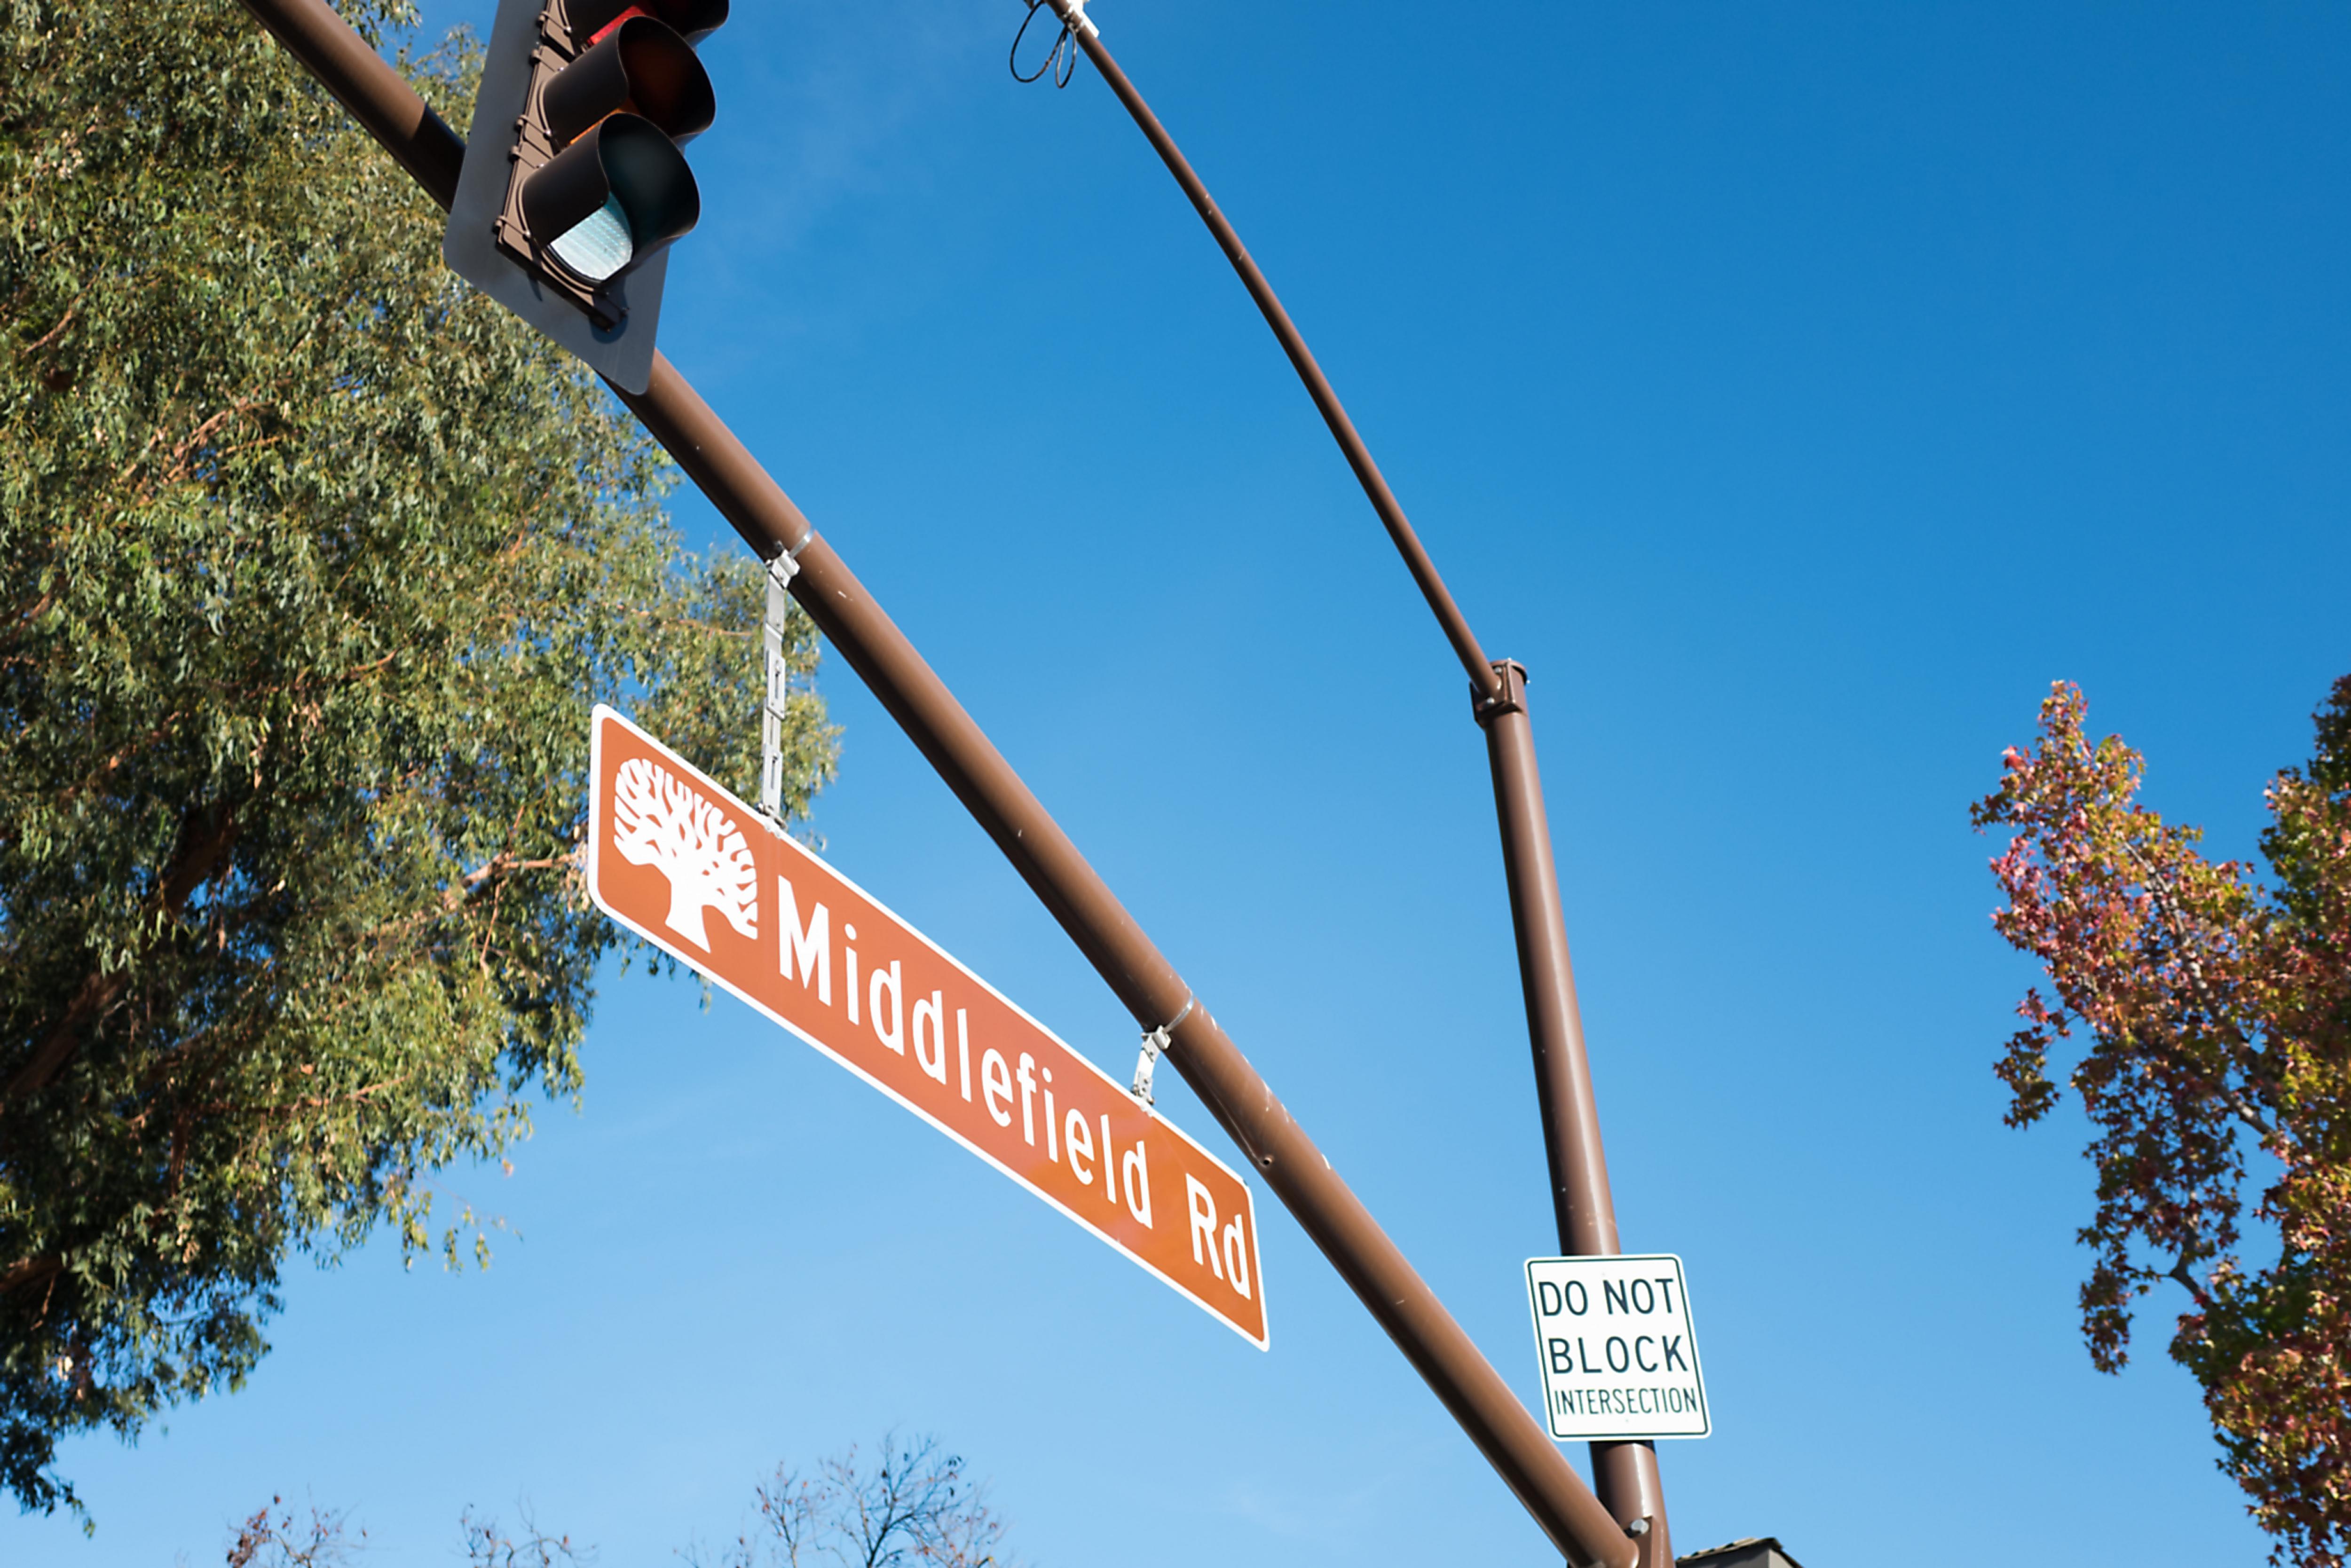 Middlefield Road